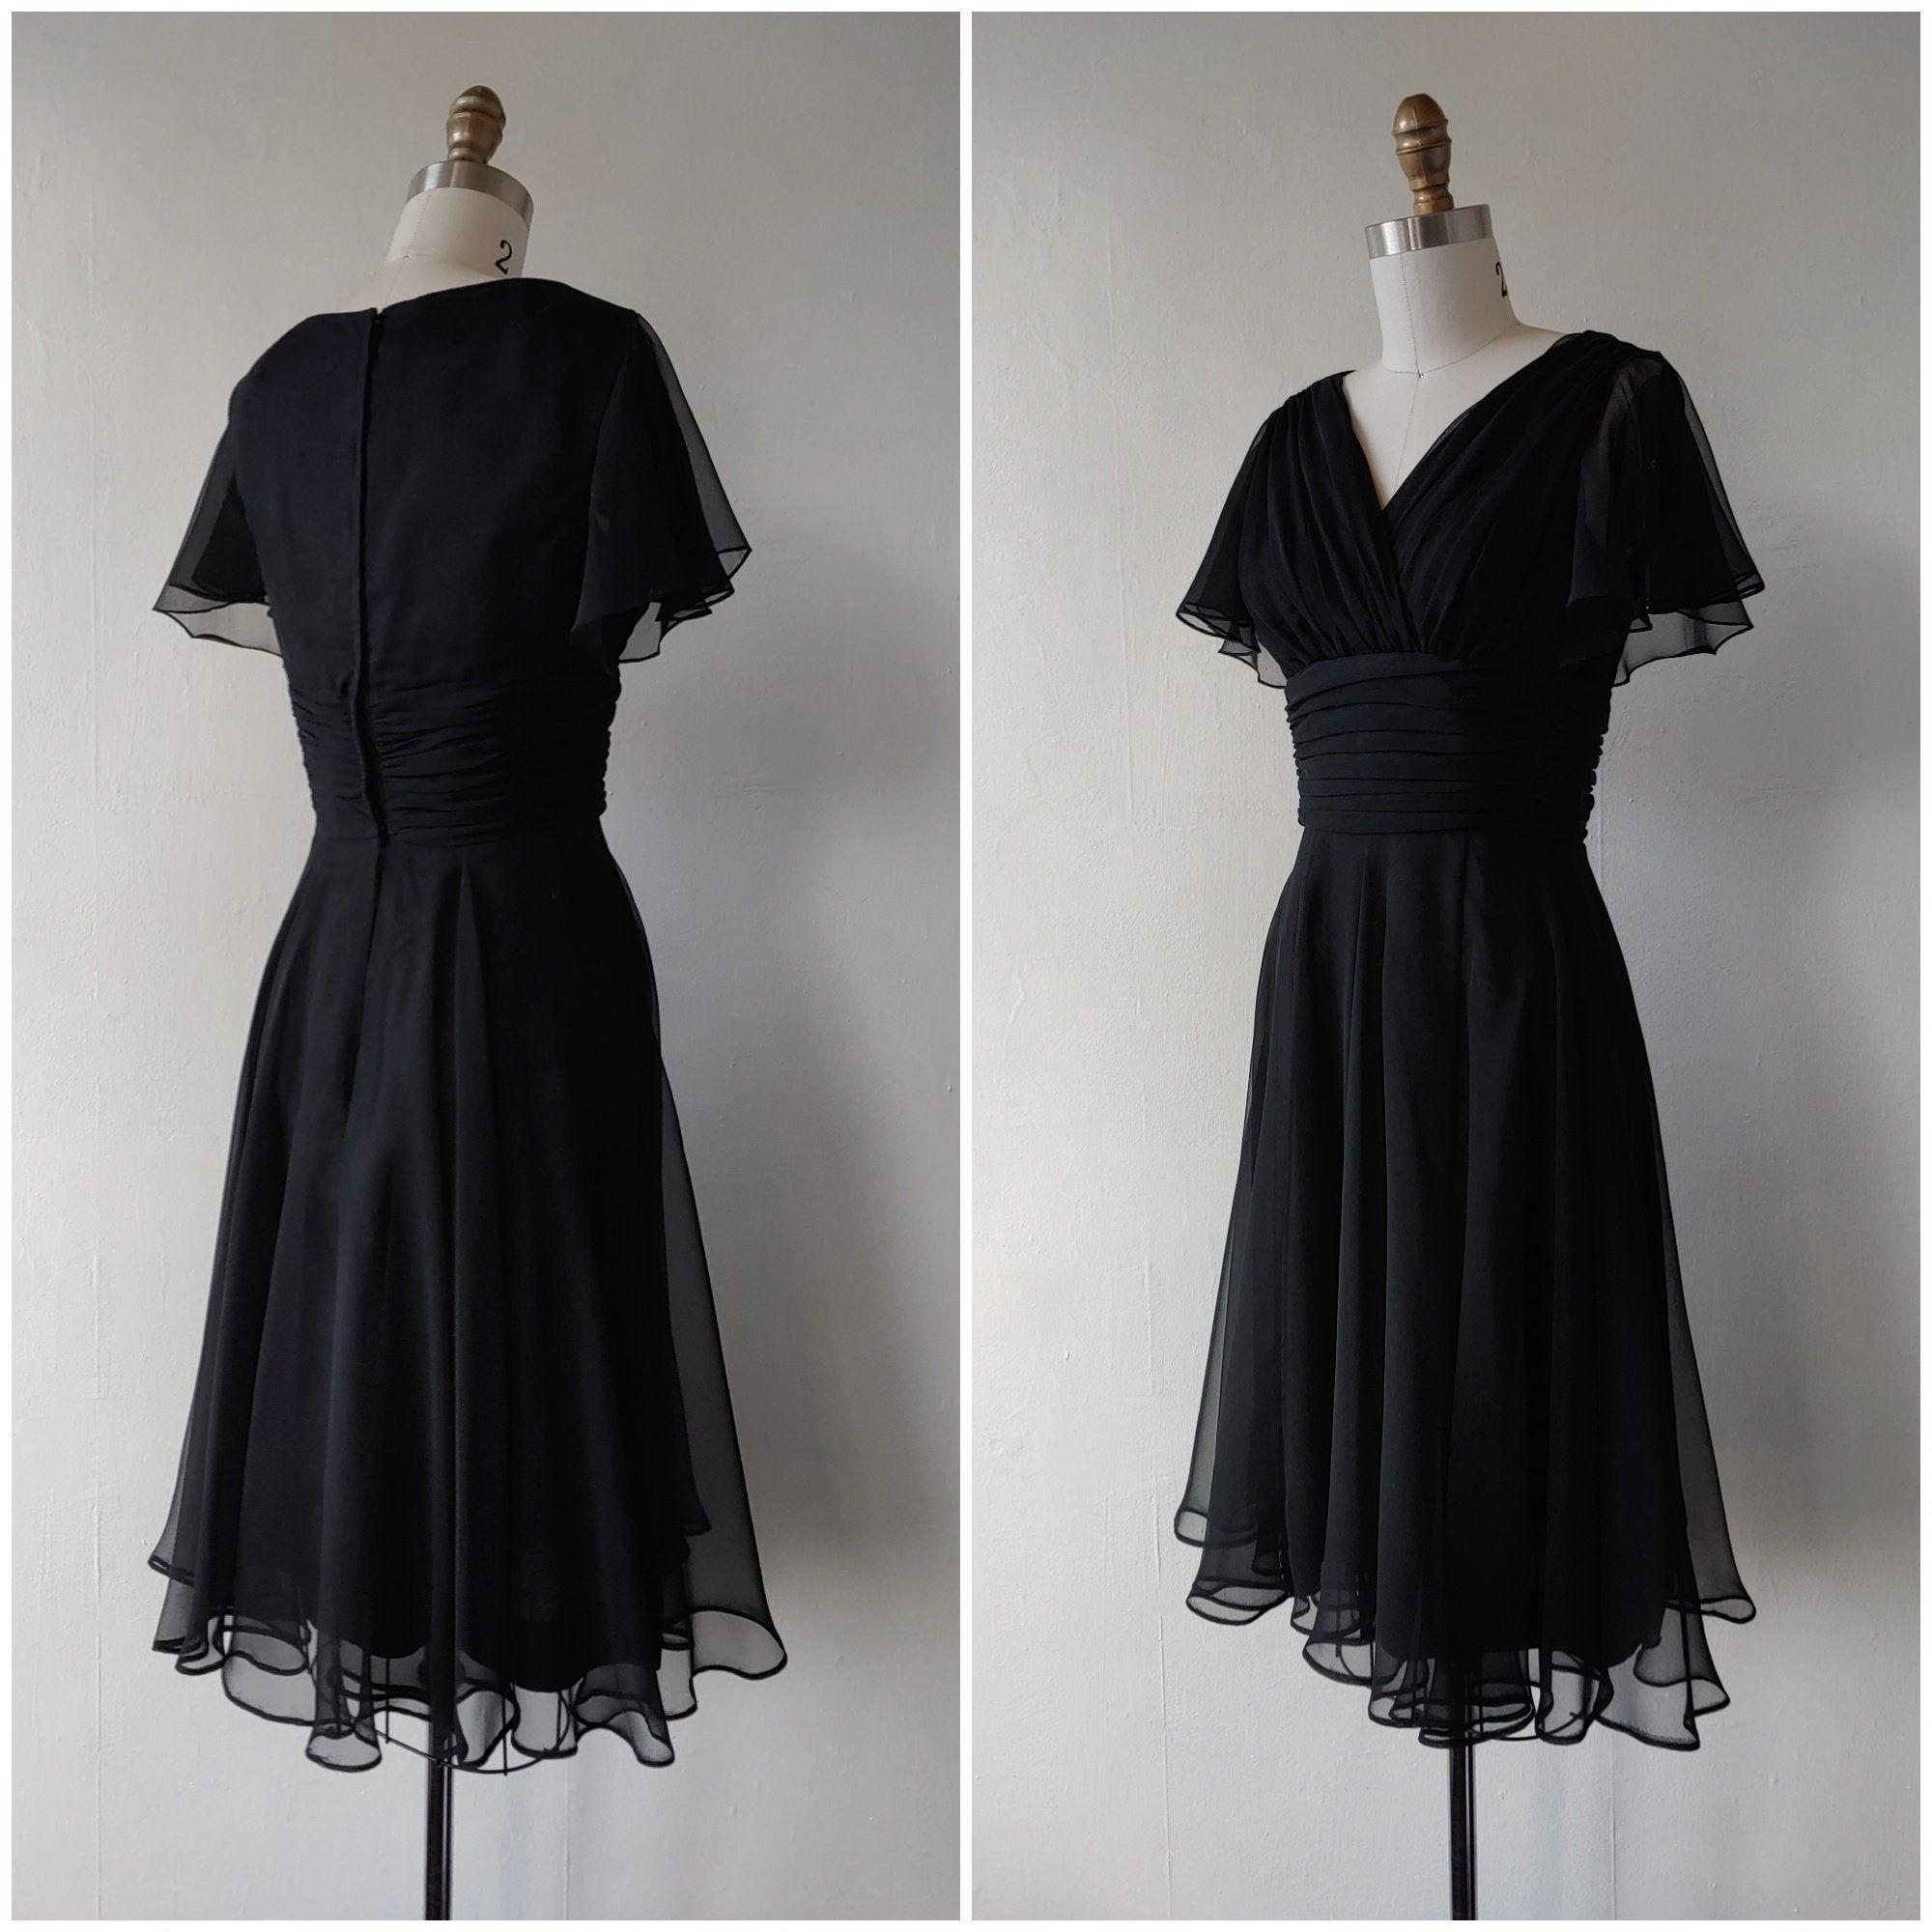 60s Black Dress Vintage 1960s Black Evening Cocktail Dress Etsy Vintage Black Dress Cocktail Evening Dresses Vintage Dresses [ 2000 x 2000 Pixel ]